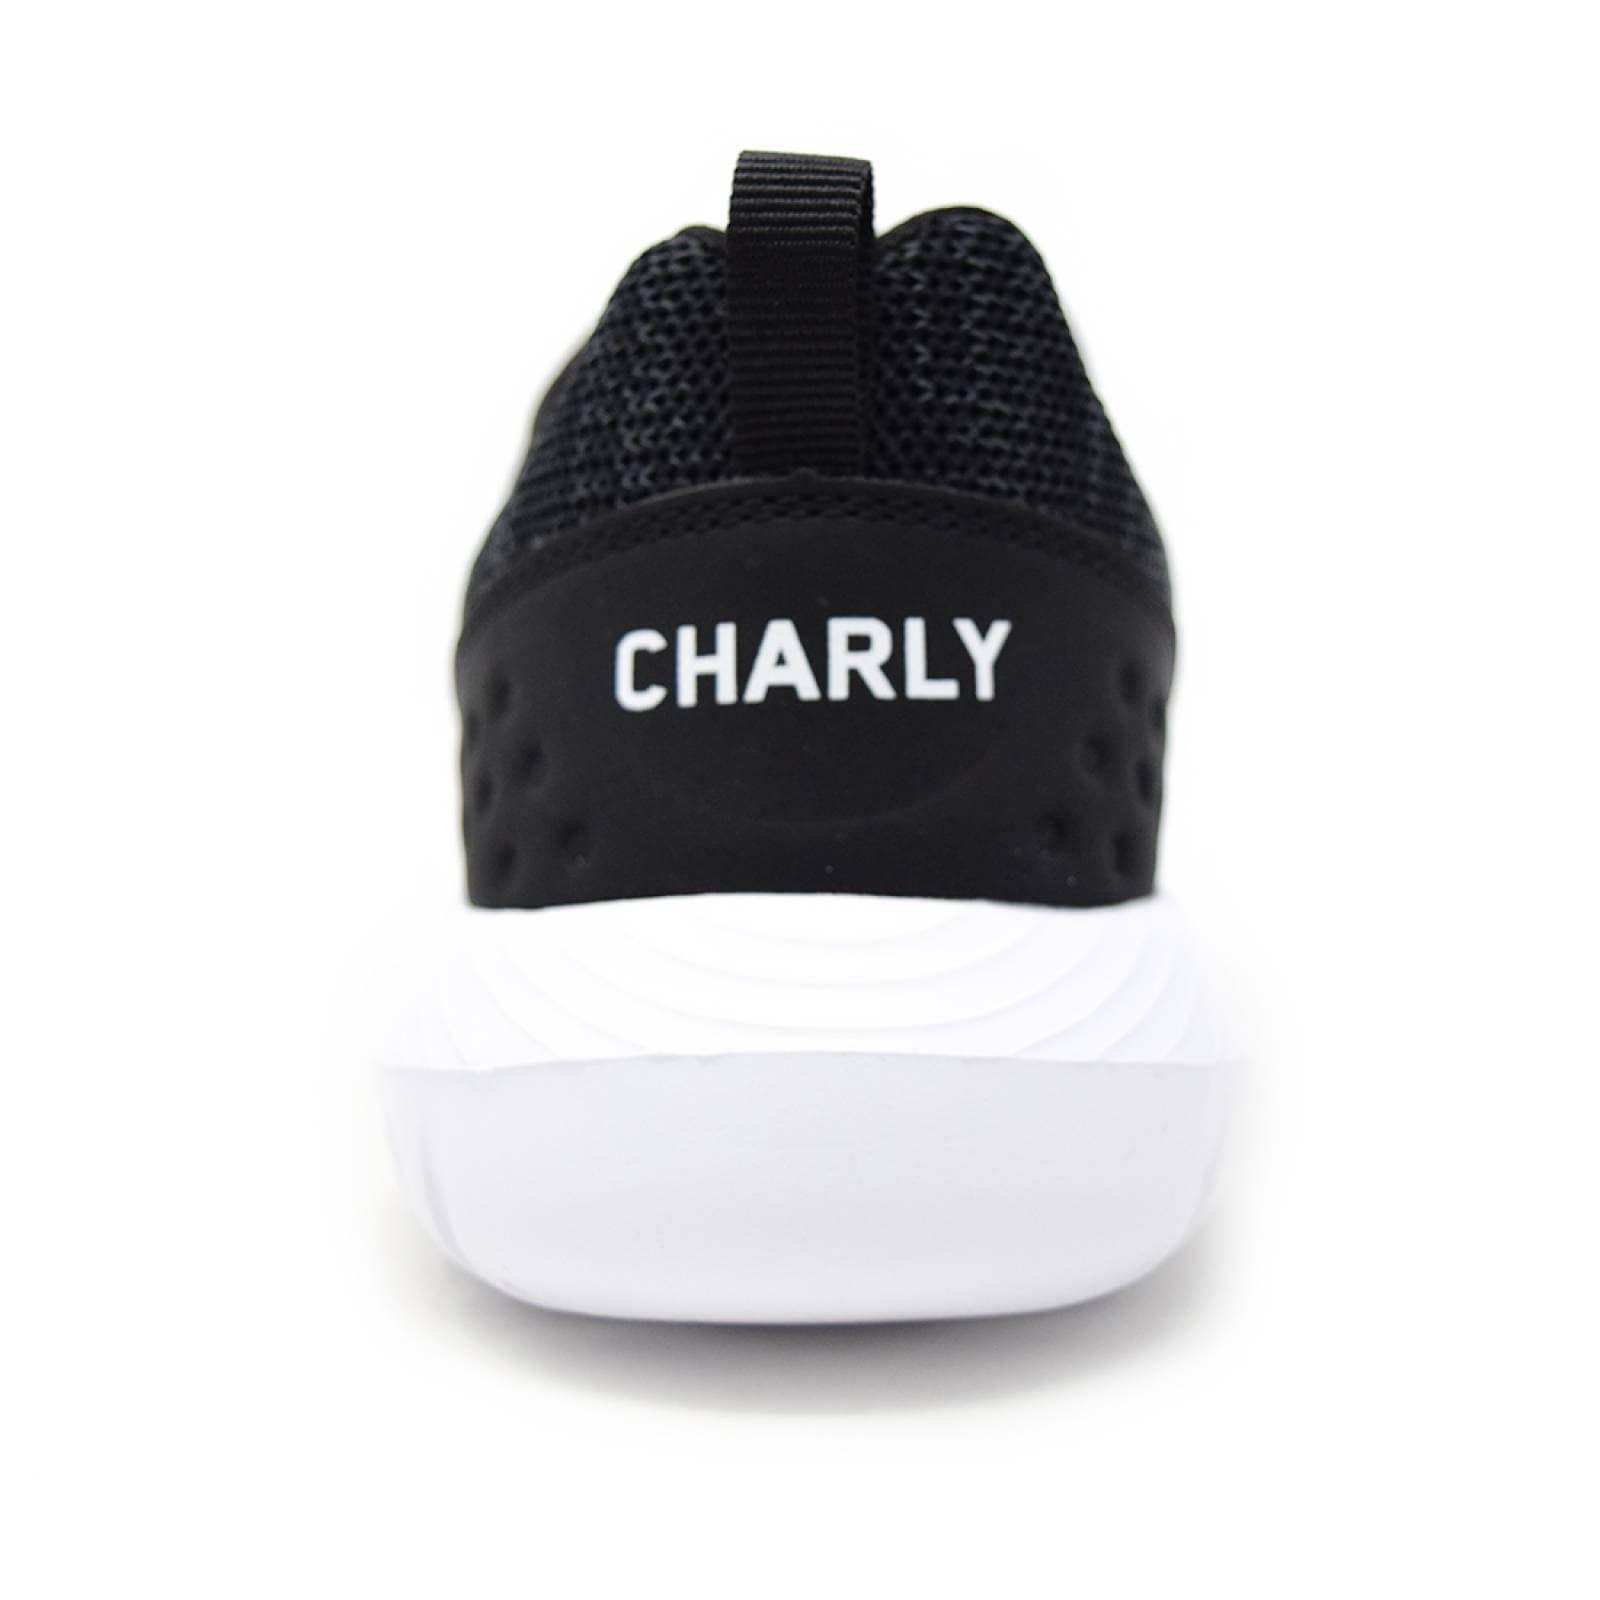 Tenis Charly para hombre - 1029535002  negro/blanco